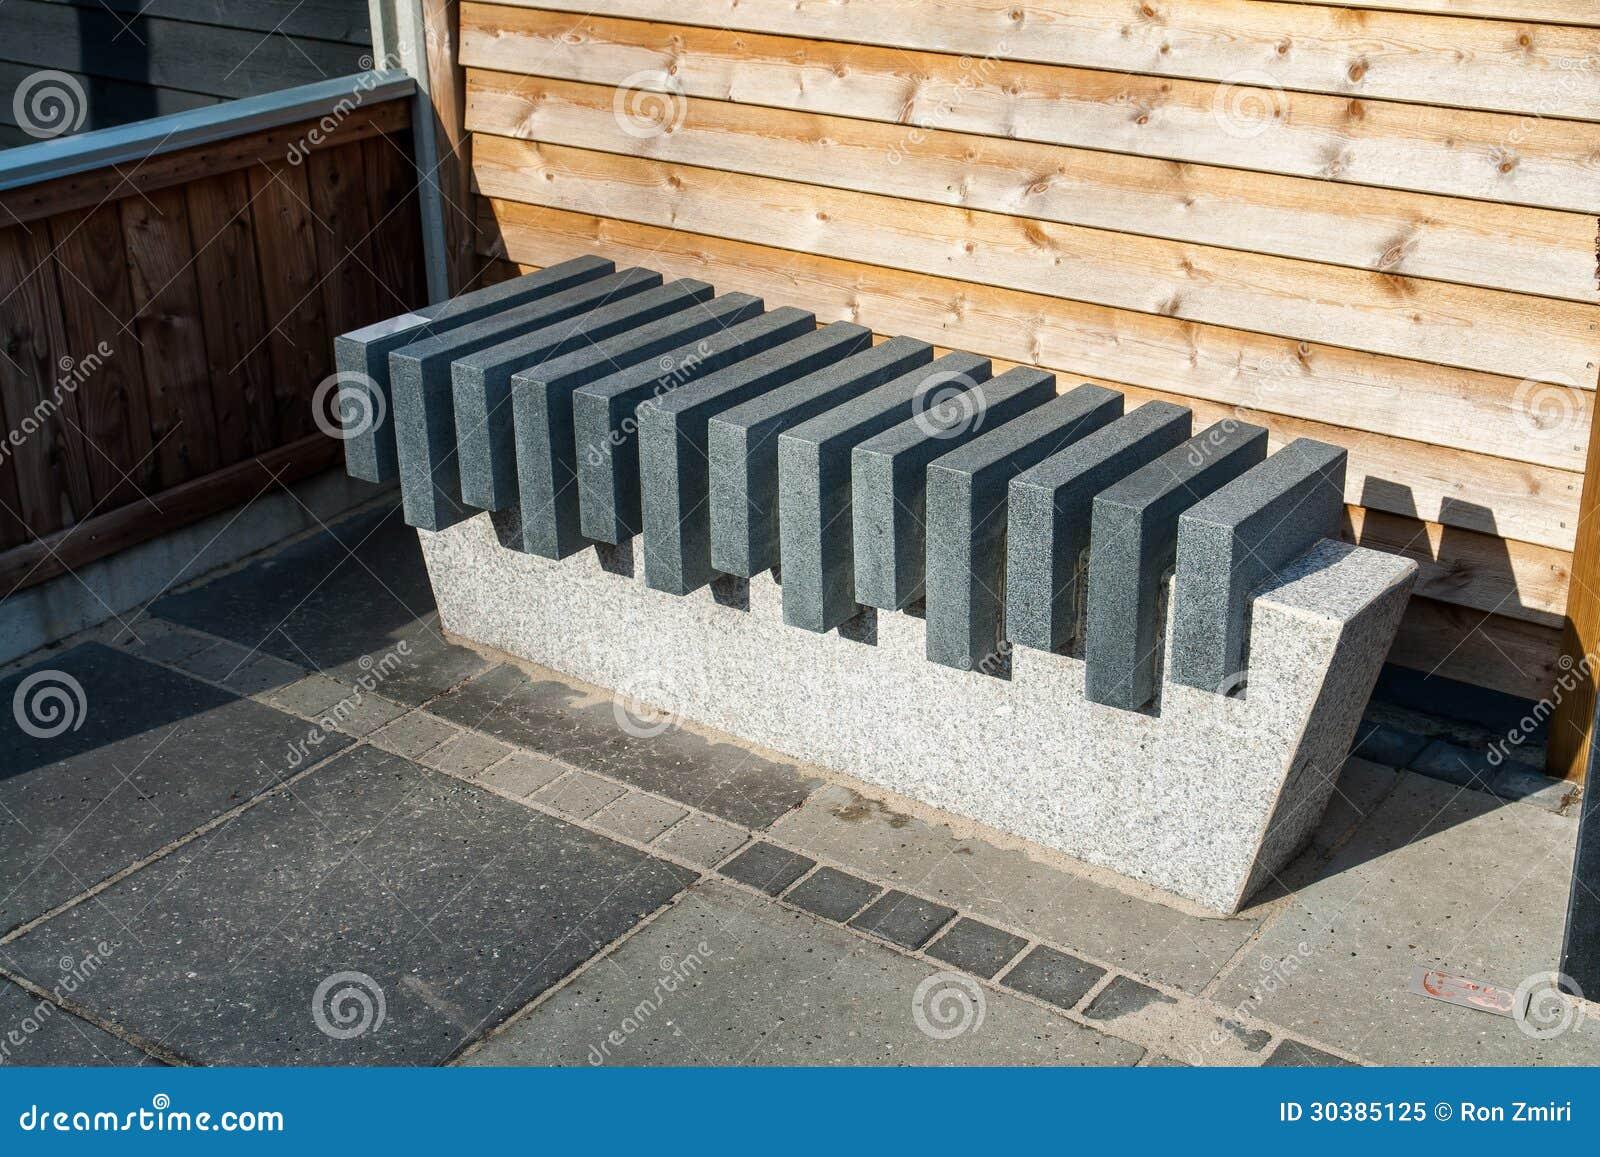 banc de marbre en pierre moderne de jardin image stock image du architecture jardin 30385125. Black Bedroom Furniture Sets. Home Design Ideas